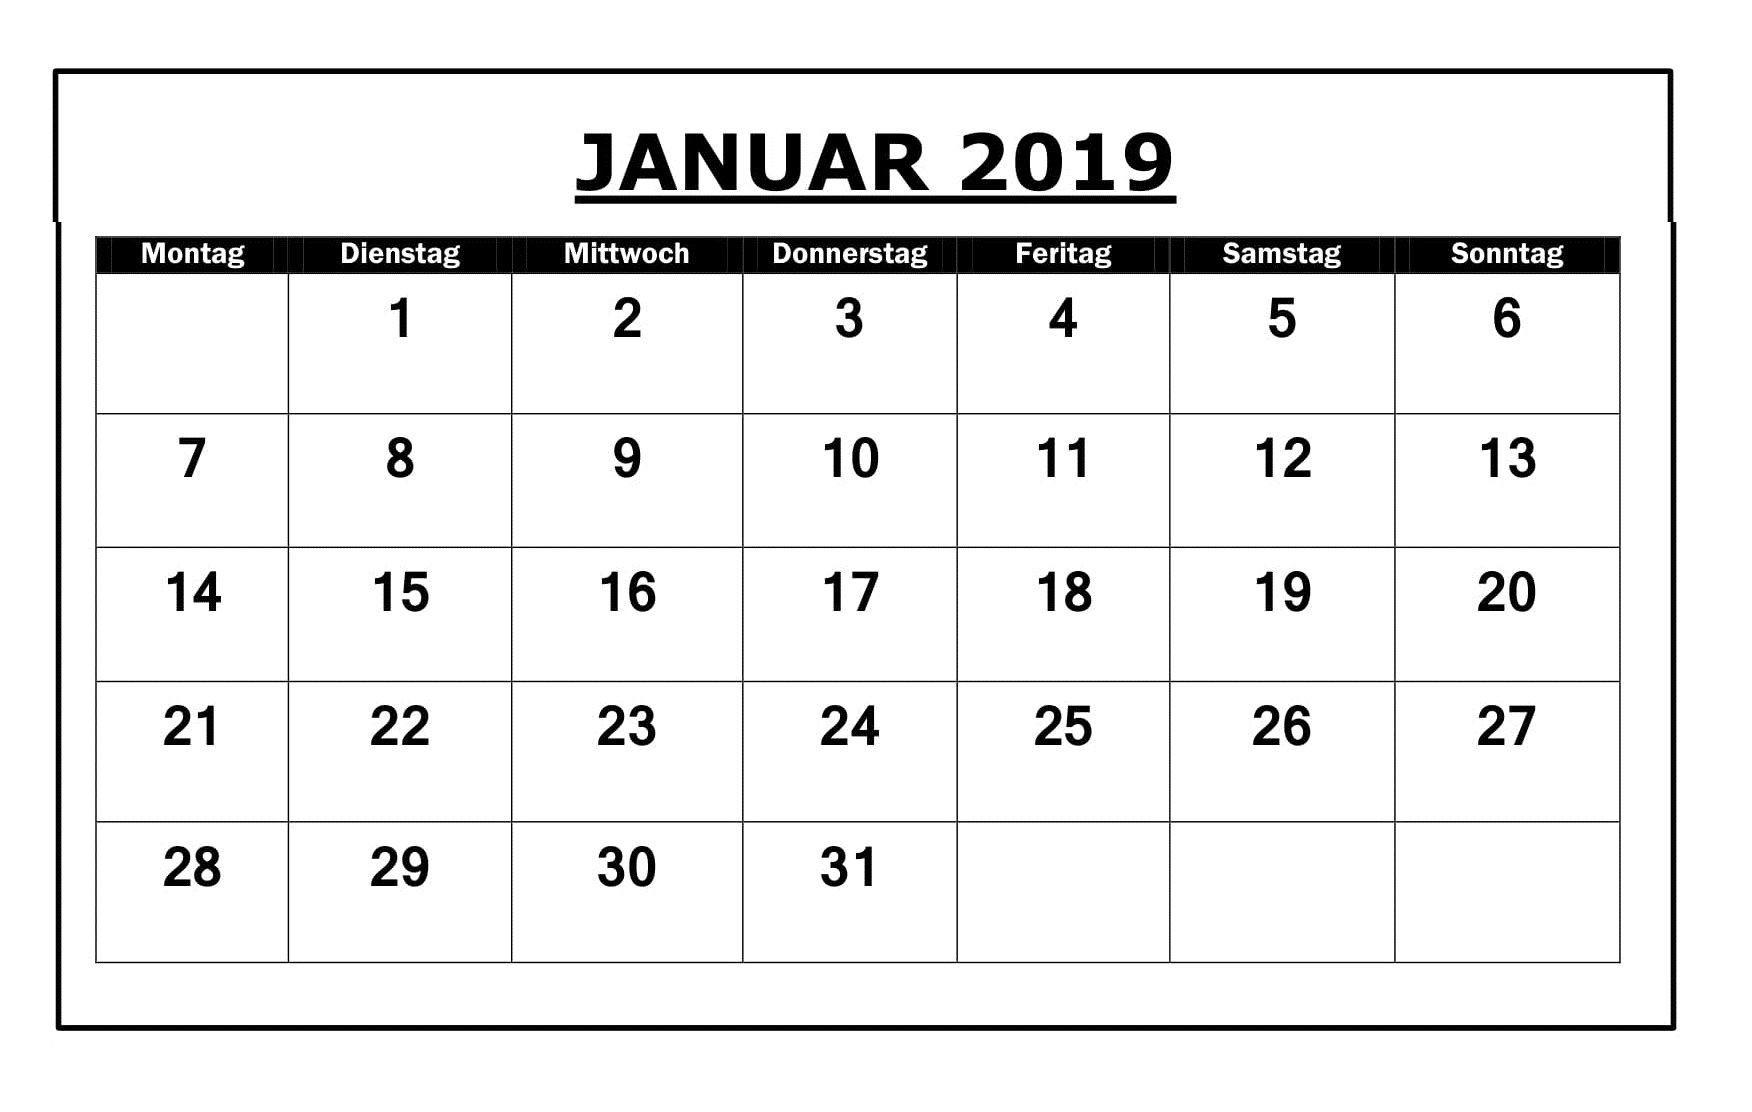 Kalender 2019 Excel Sachsen Actual Kalender 2019 Monate Zum Ausdrucken Of Kalender 2019 Excel Sachsen Más Arriba-a-fecha Excel Kalender 2015 Kubra Kubkireklamowe